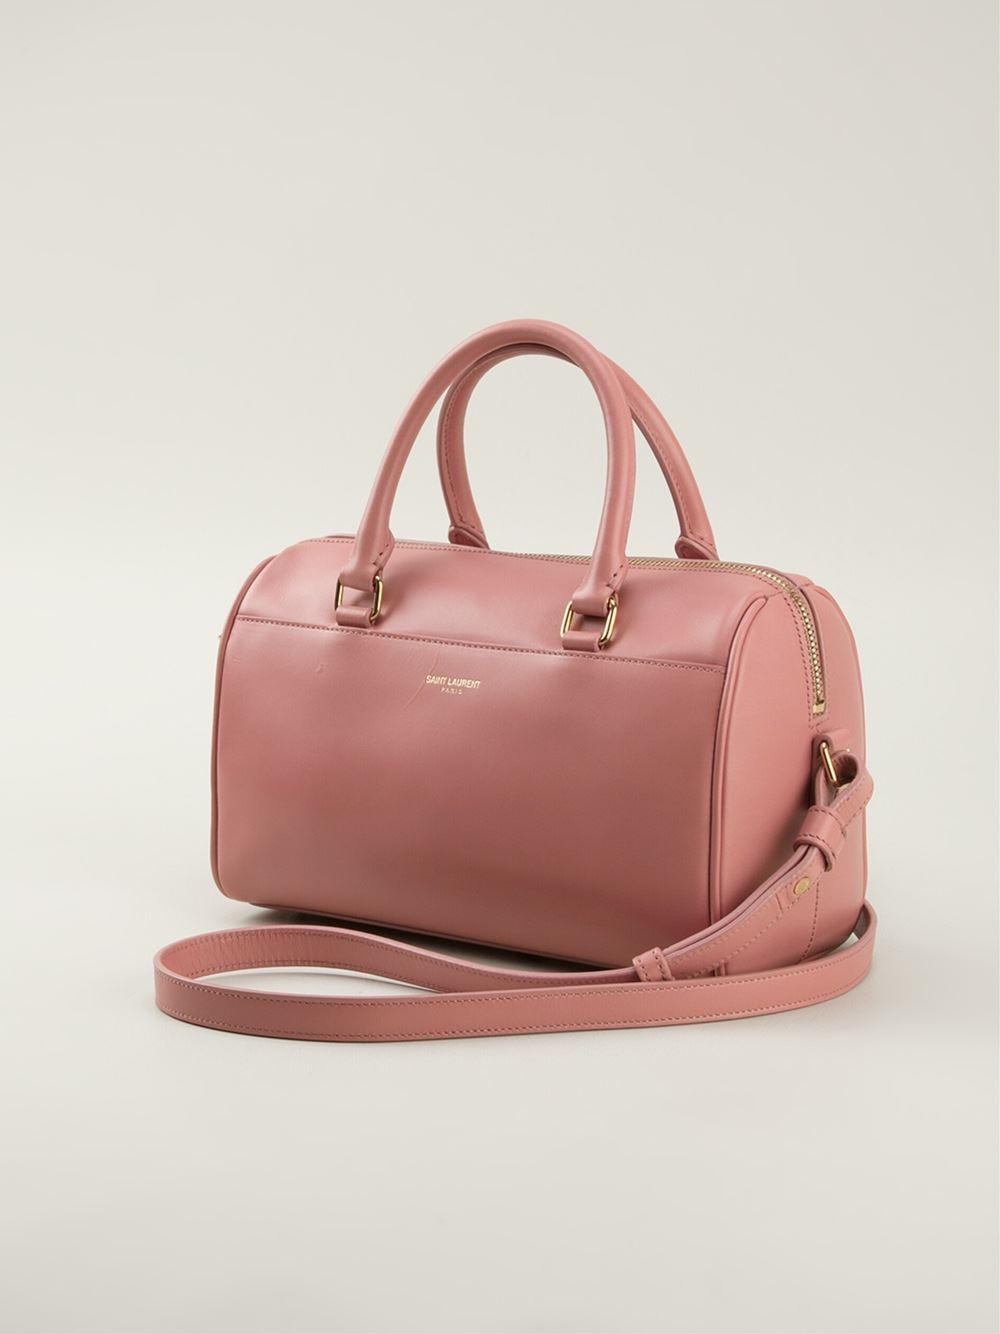 acd71e5b5c Lyst - Saint laurent Duffle Cross Body Bag in Pink